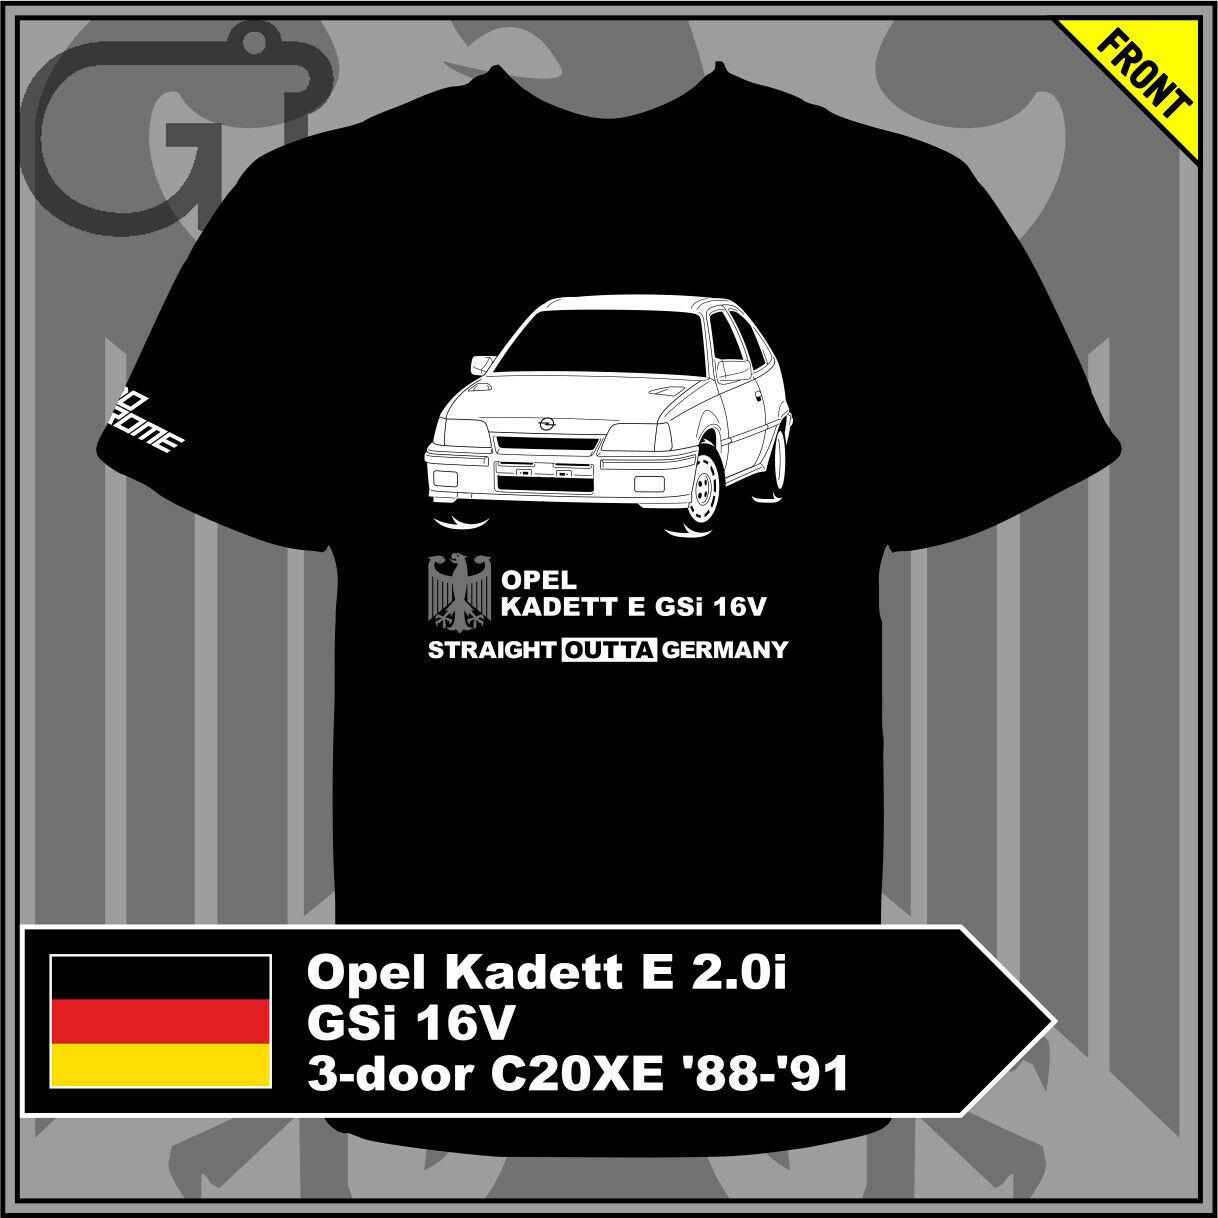 GT-shirt Opel Kadett E 2.0i GSi 16V 3-door C20XE '88-'91 Tshirt Tee